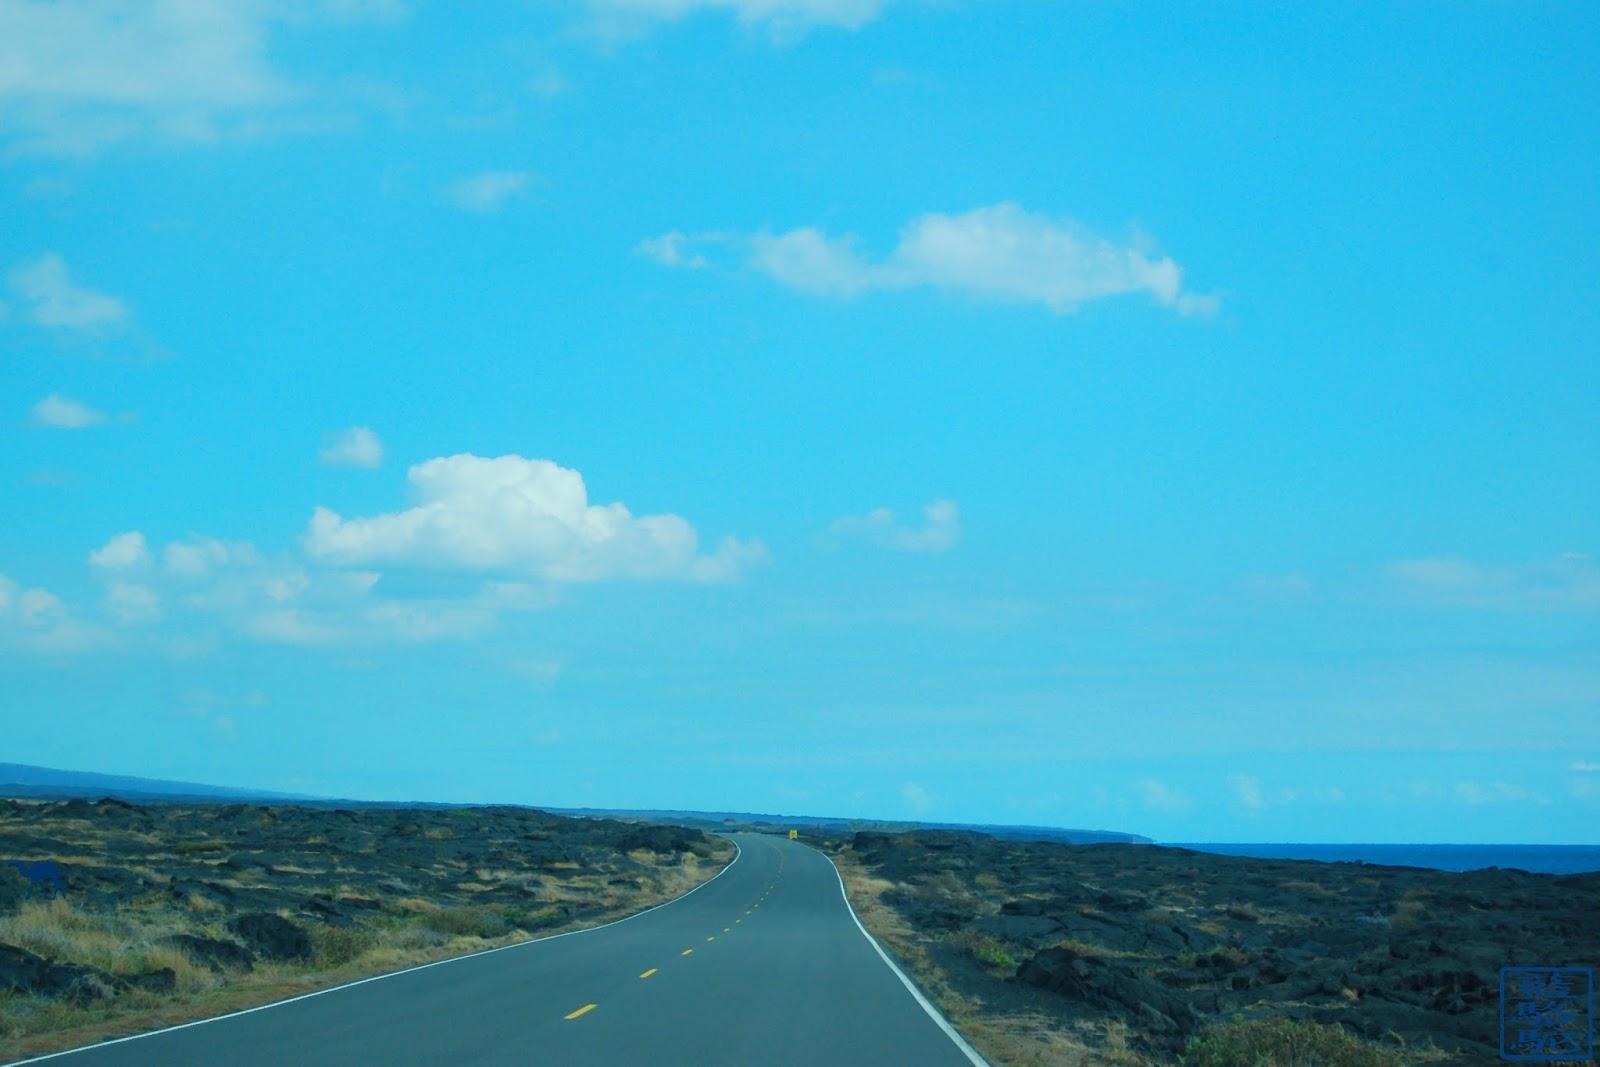 Le Chameau Bleu - Blog Voyage Hawaii - Voyage à Hawaii - Instantanés d'Hawaii